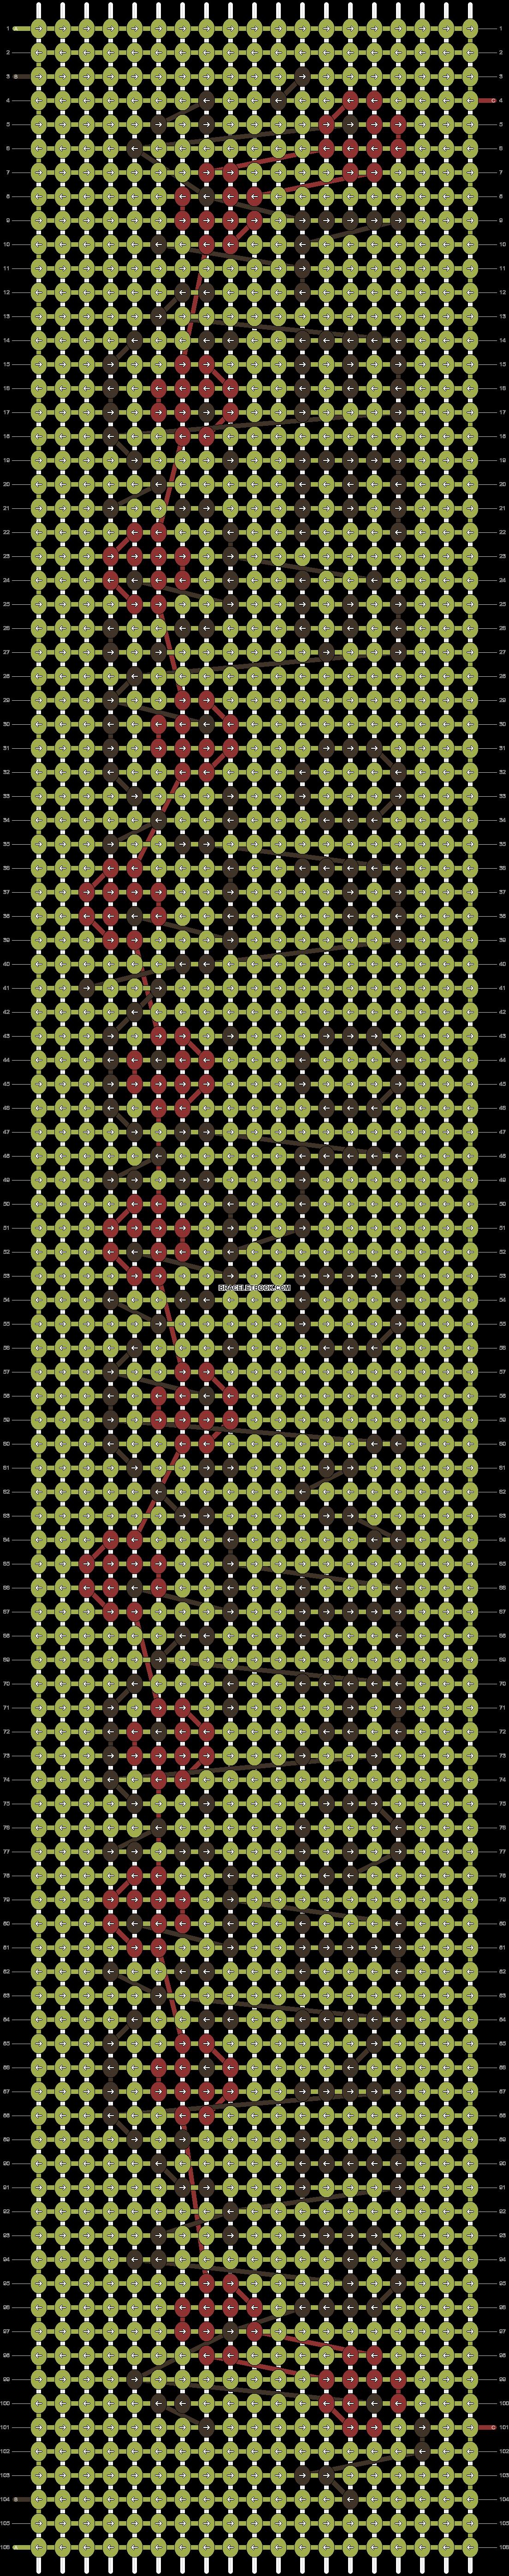 Alpha pattern #48803 pattern